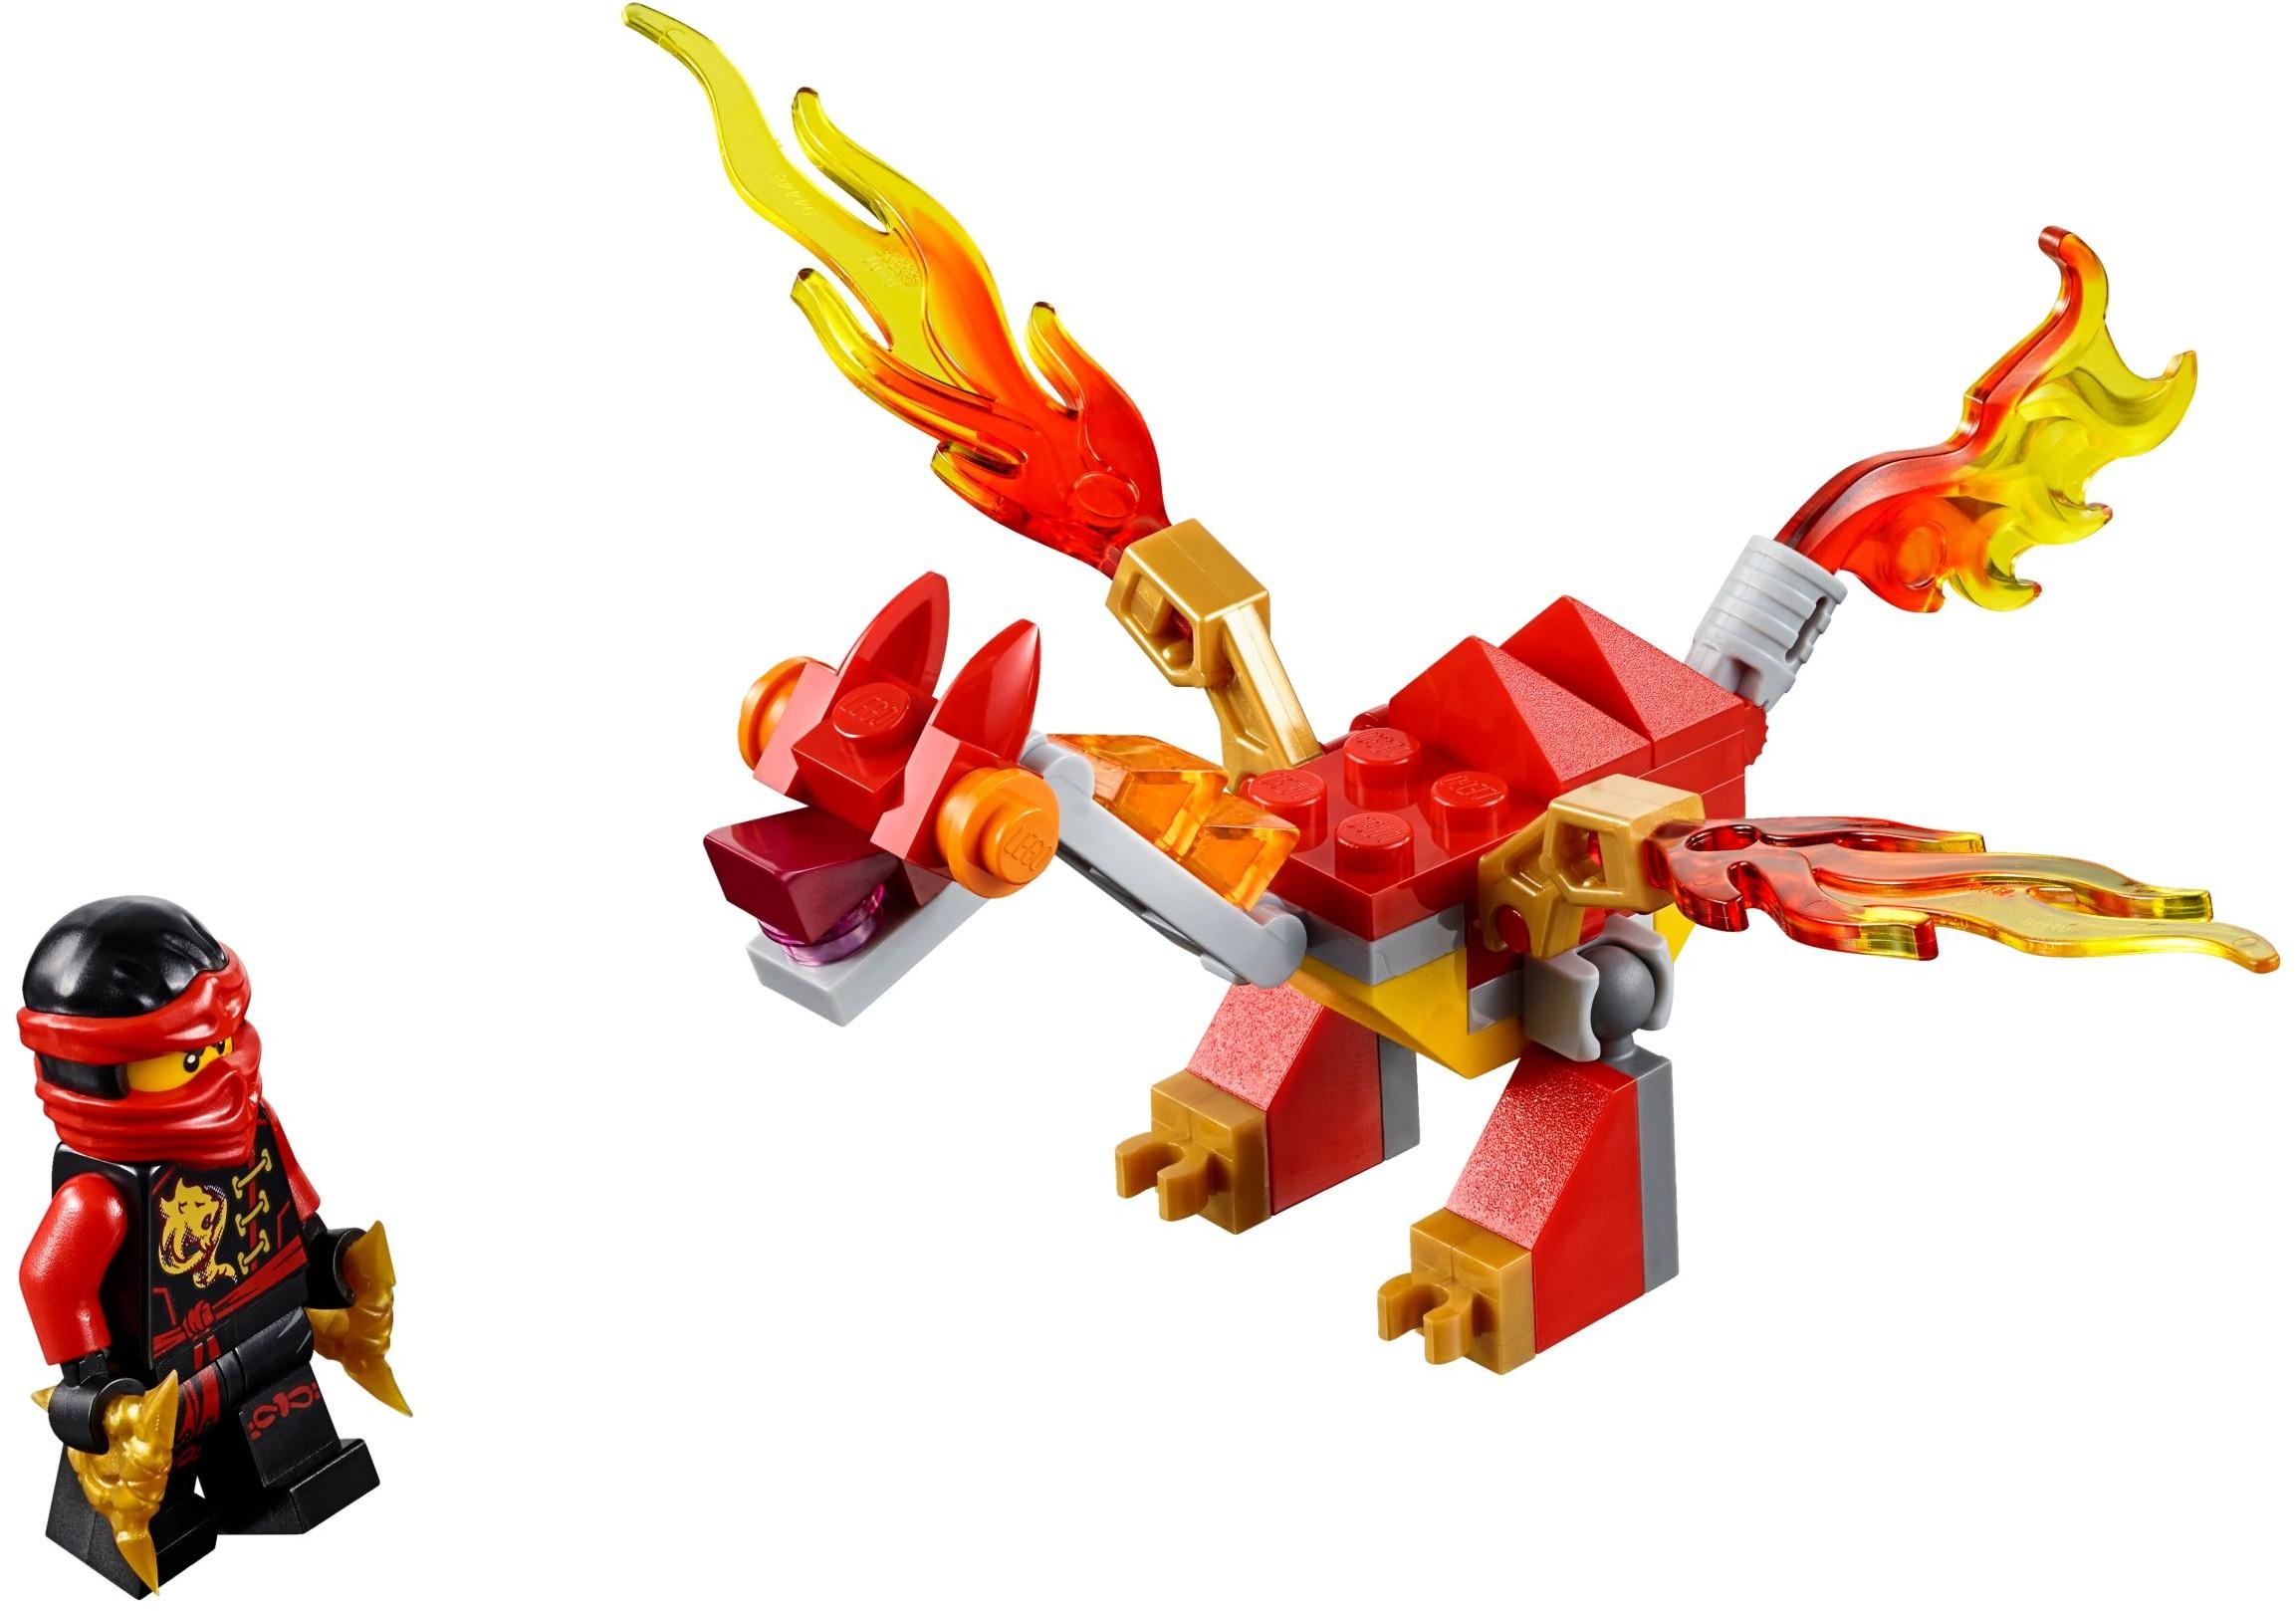 Ninjago 2016 brickset lego set guide and database - Ninjago lego kai ...